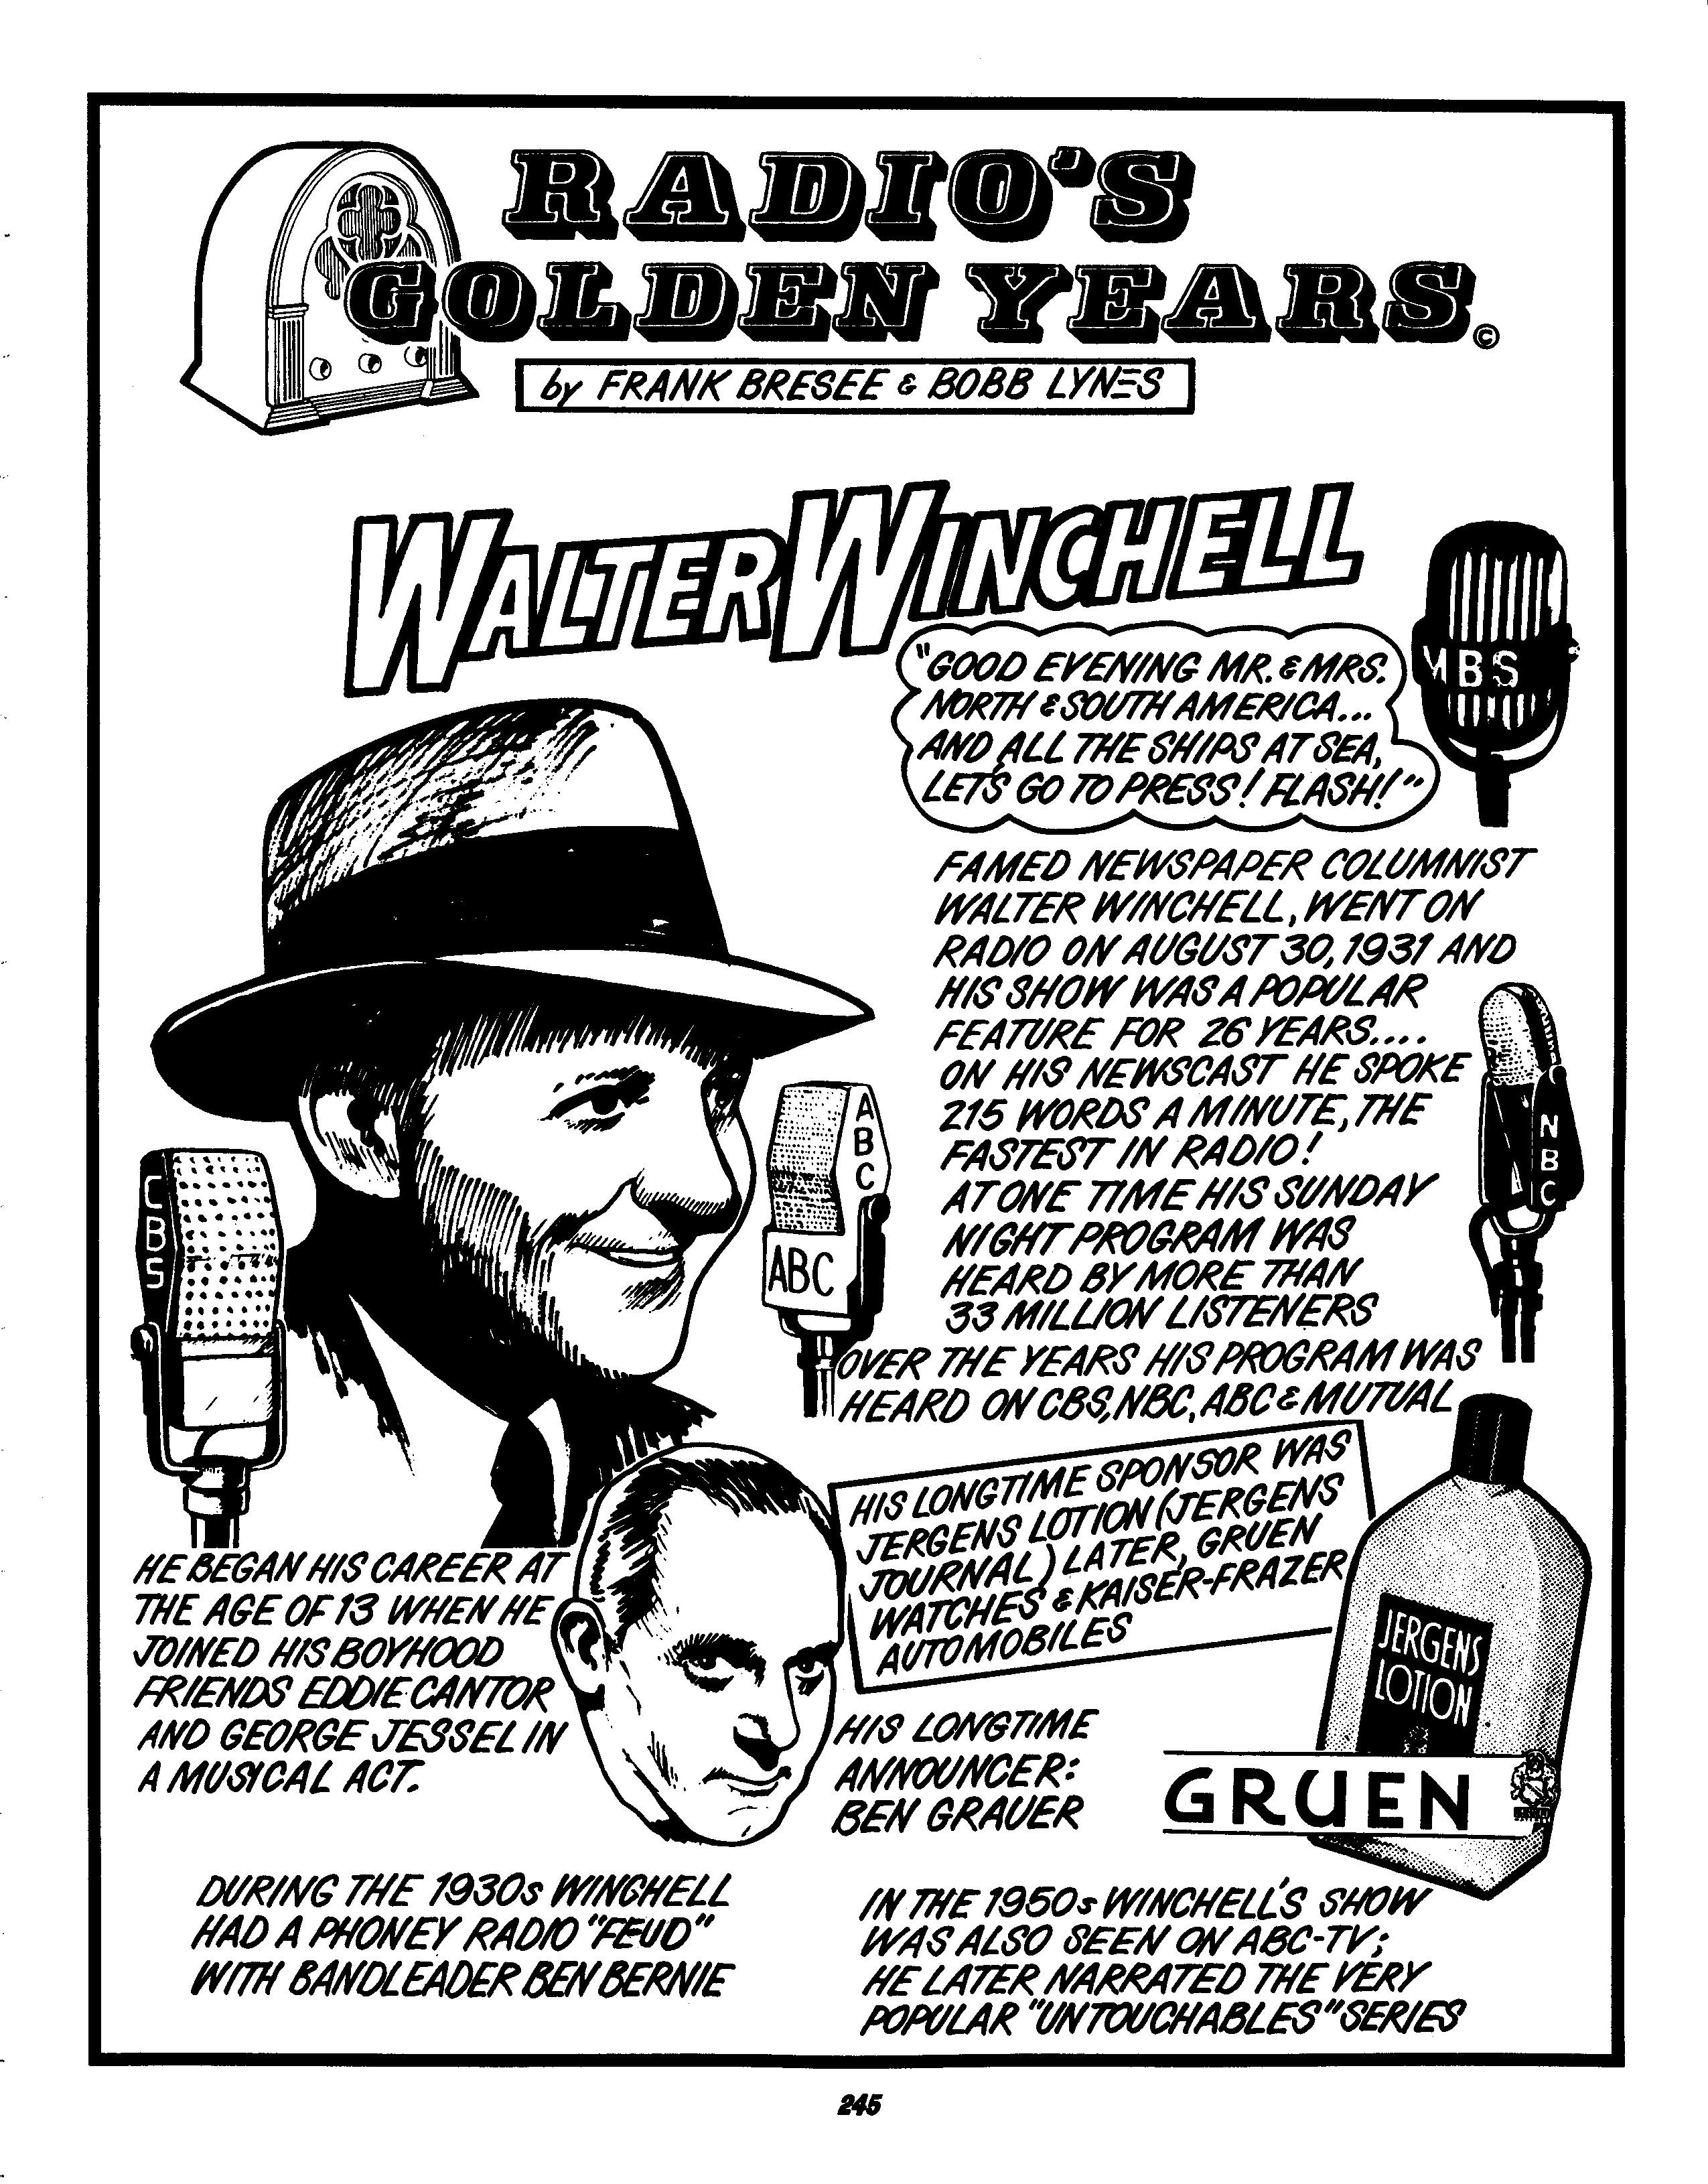 Walter Winchell